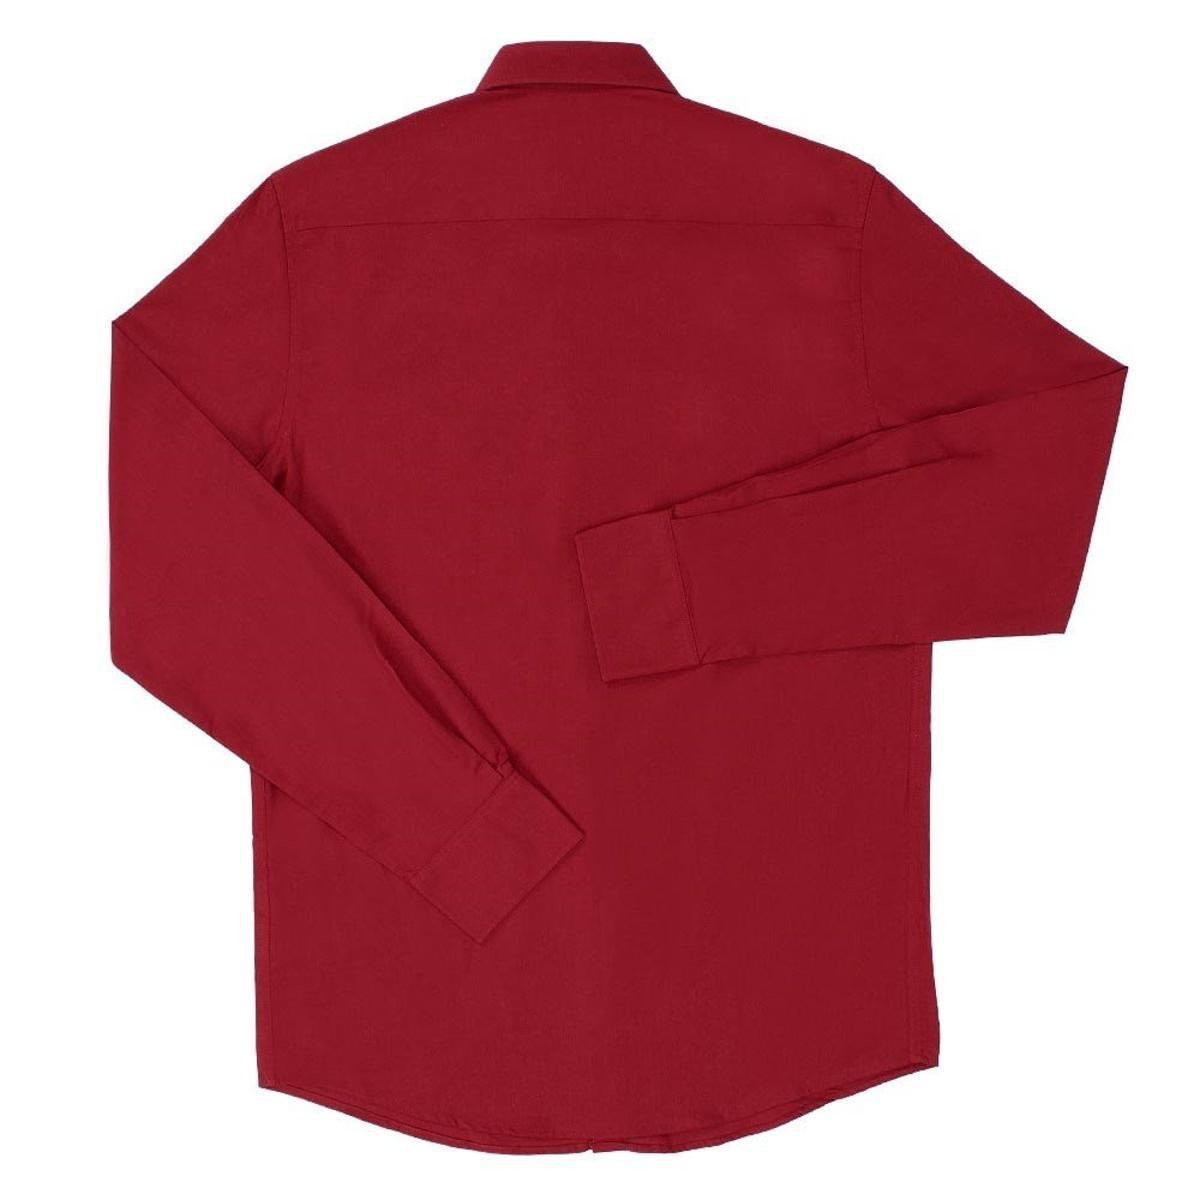 Camisa Lisa Masculina Manga Longa Tassa - Vermelho - Compre Agora ... 8baca8fc2ffd3